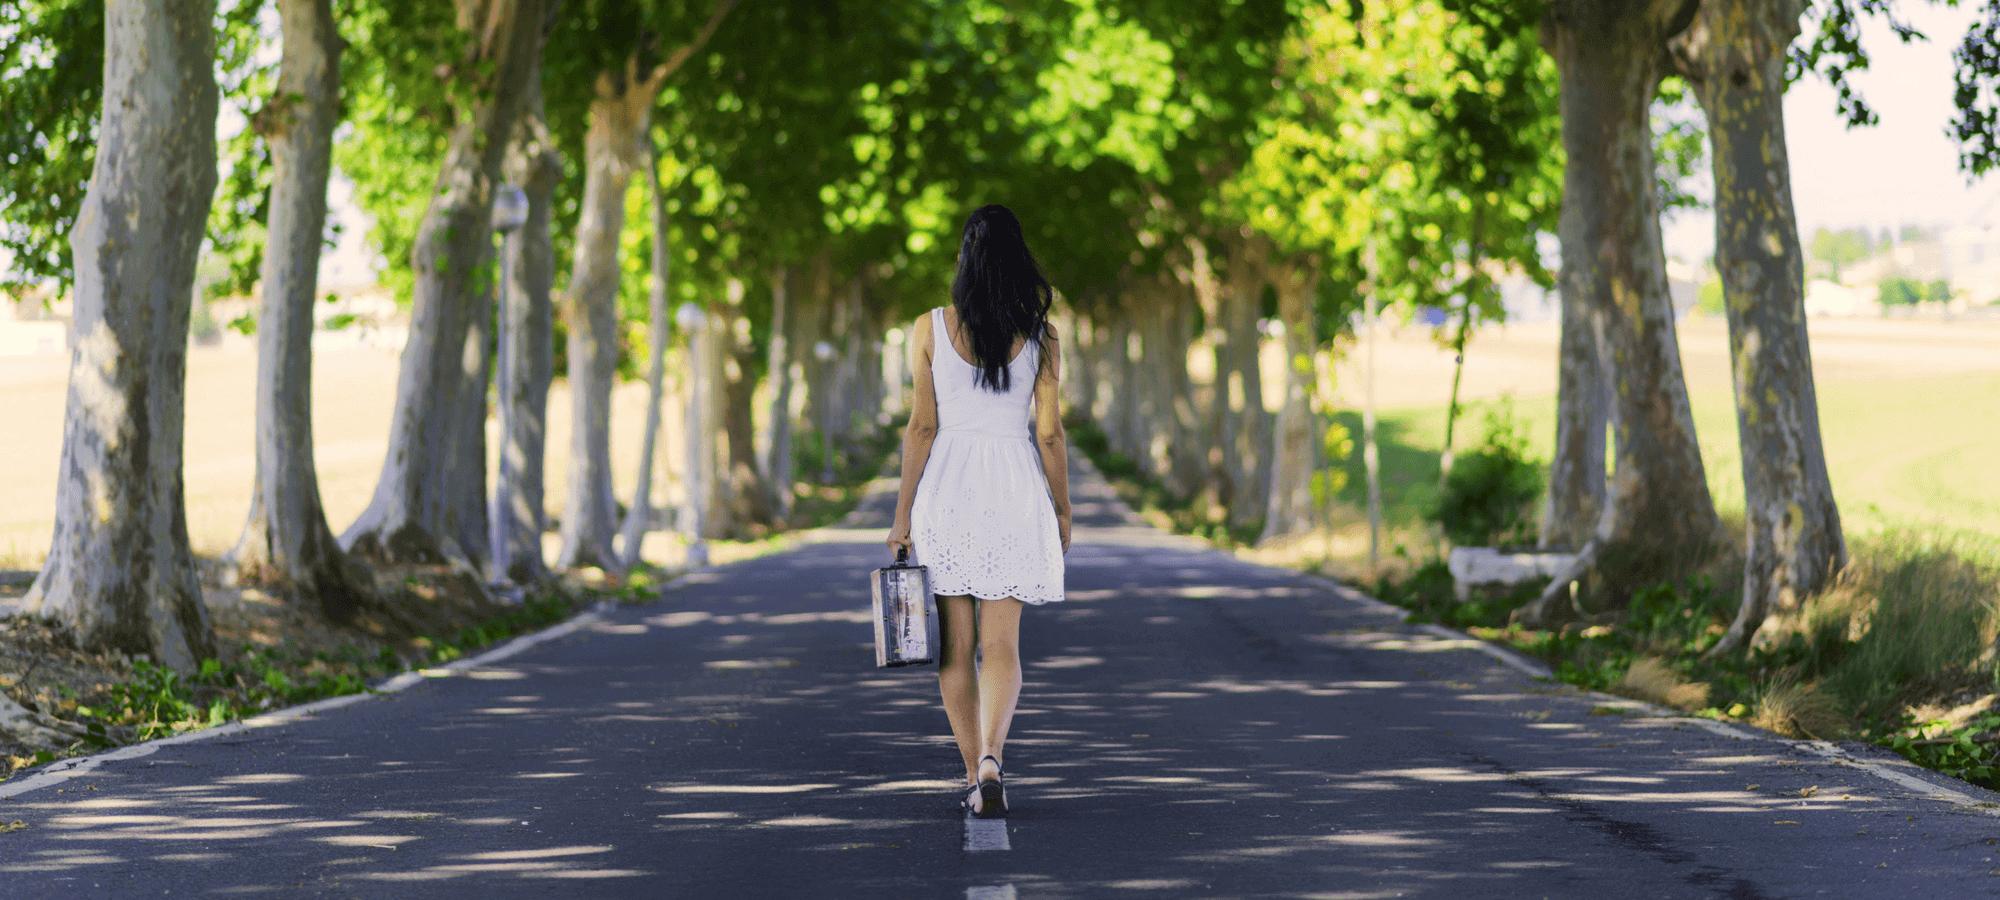 woman walking down a tree lined road